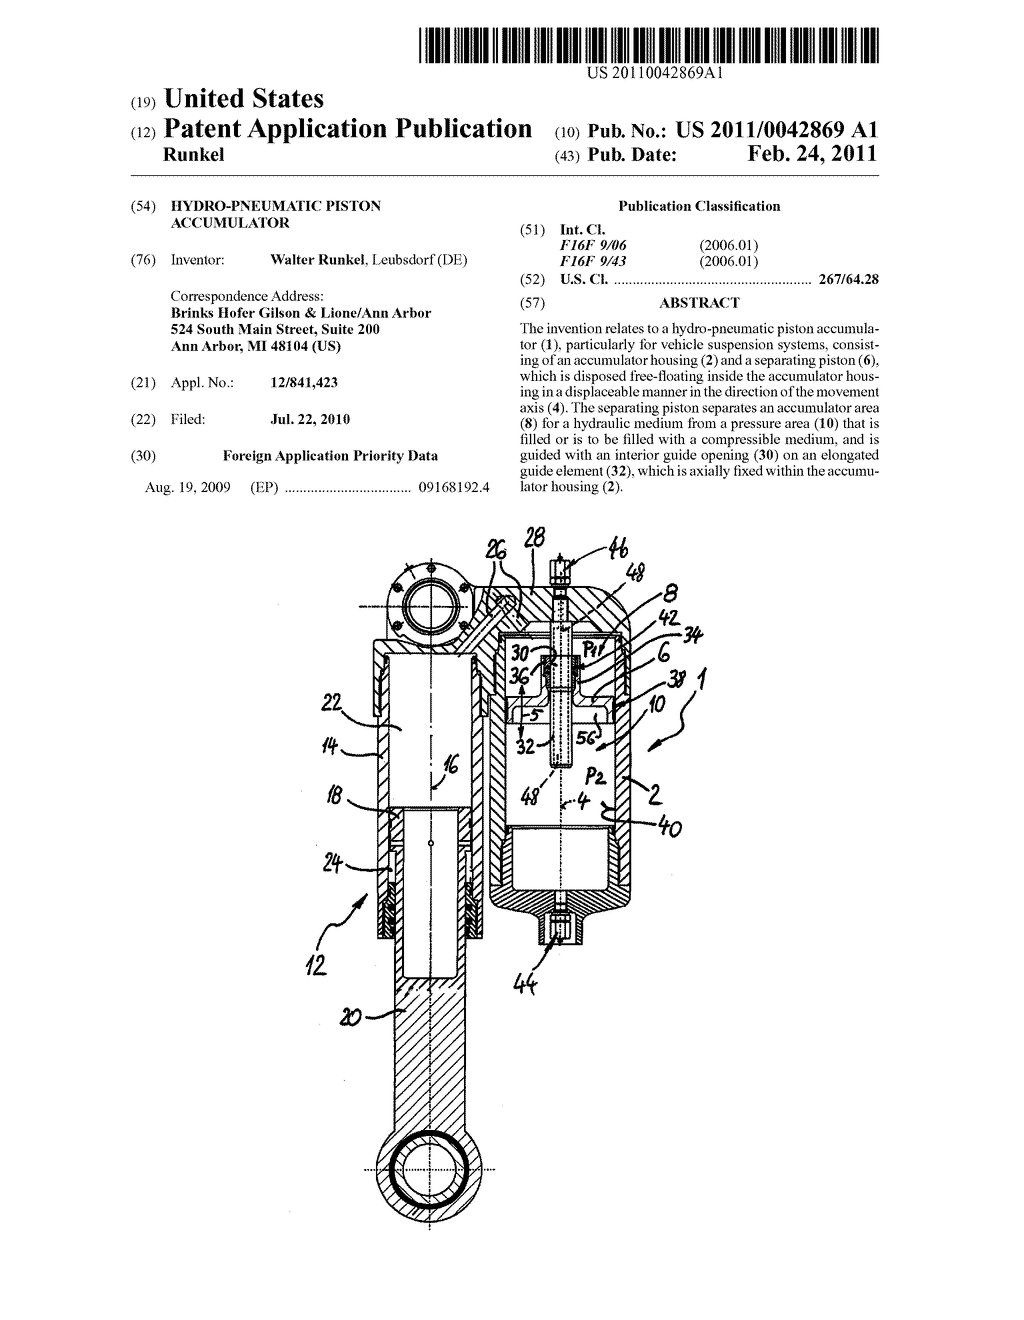 hydro pneumatic piston accumulator diagram, schematic, and image 01